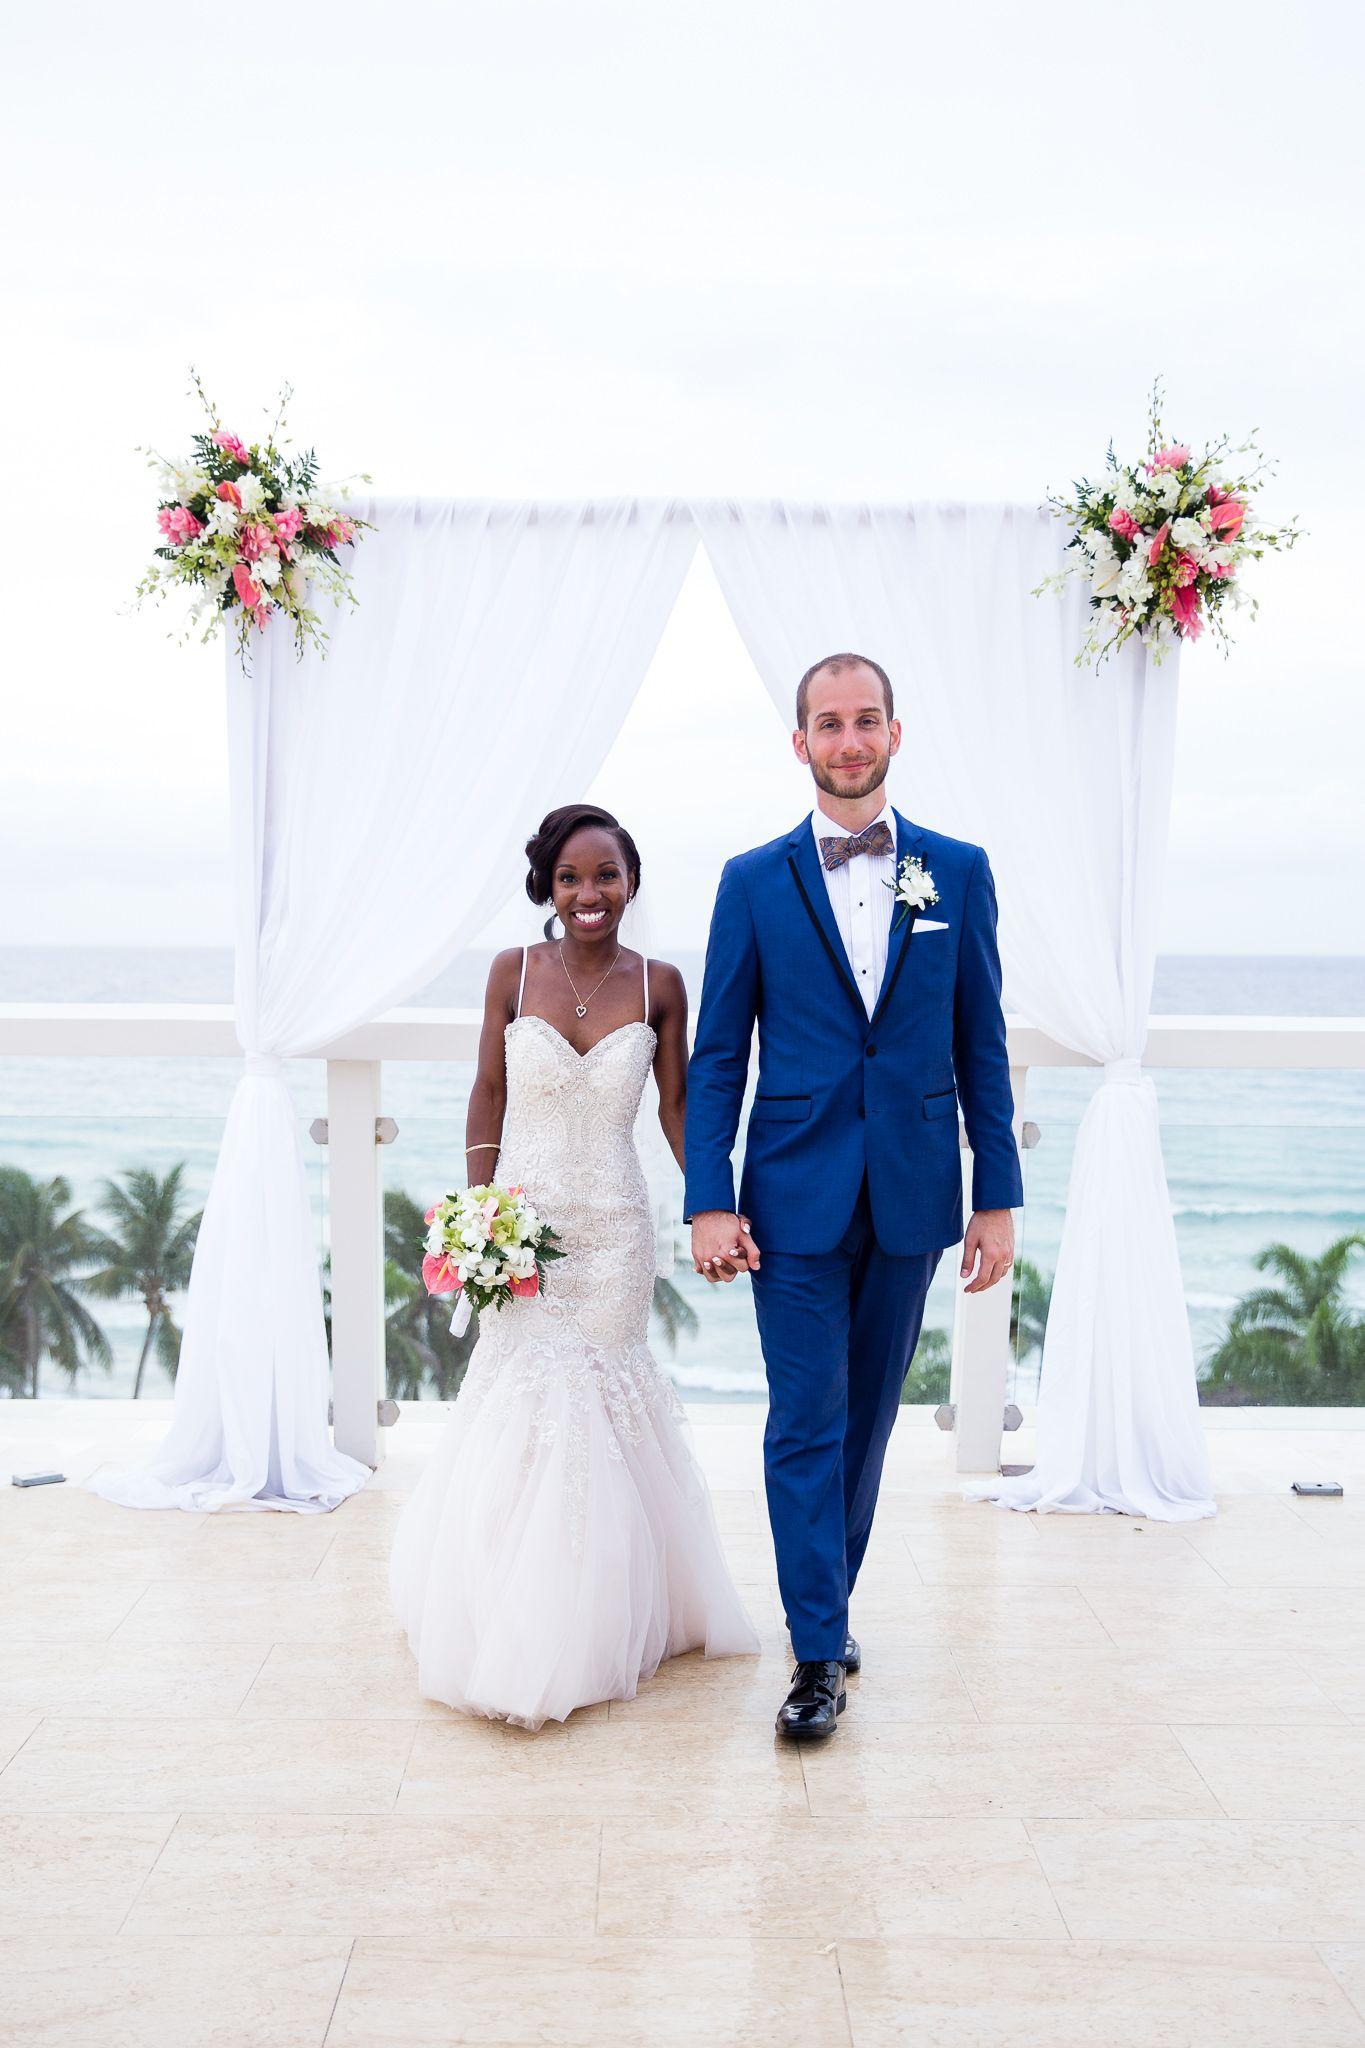 Montego Bay Jamaica Wedding With Erica And Mike Sarah Bode Clark Photography Jamaica Beach Wedding Montego Bay Wedding Jamaica Wedding